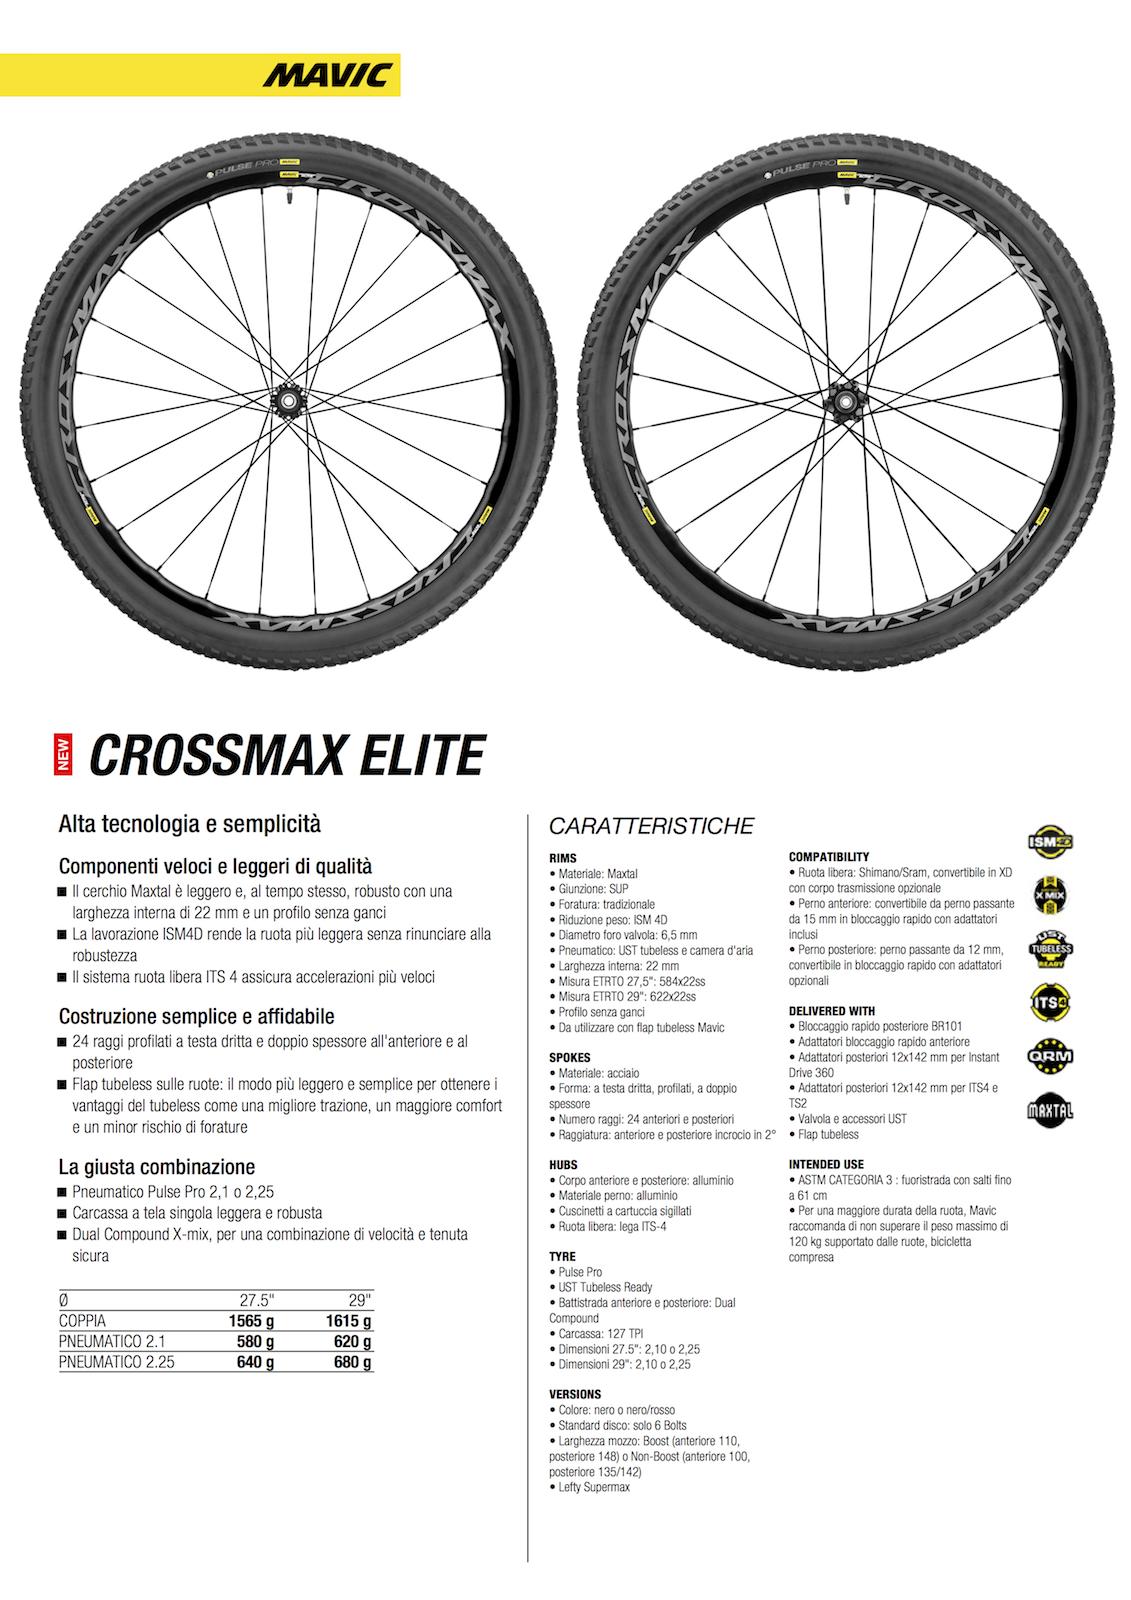 F55001_Crossmax_Elite